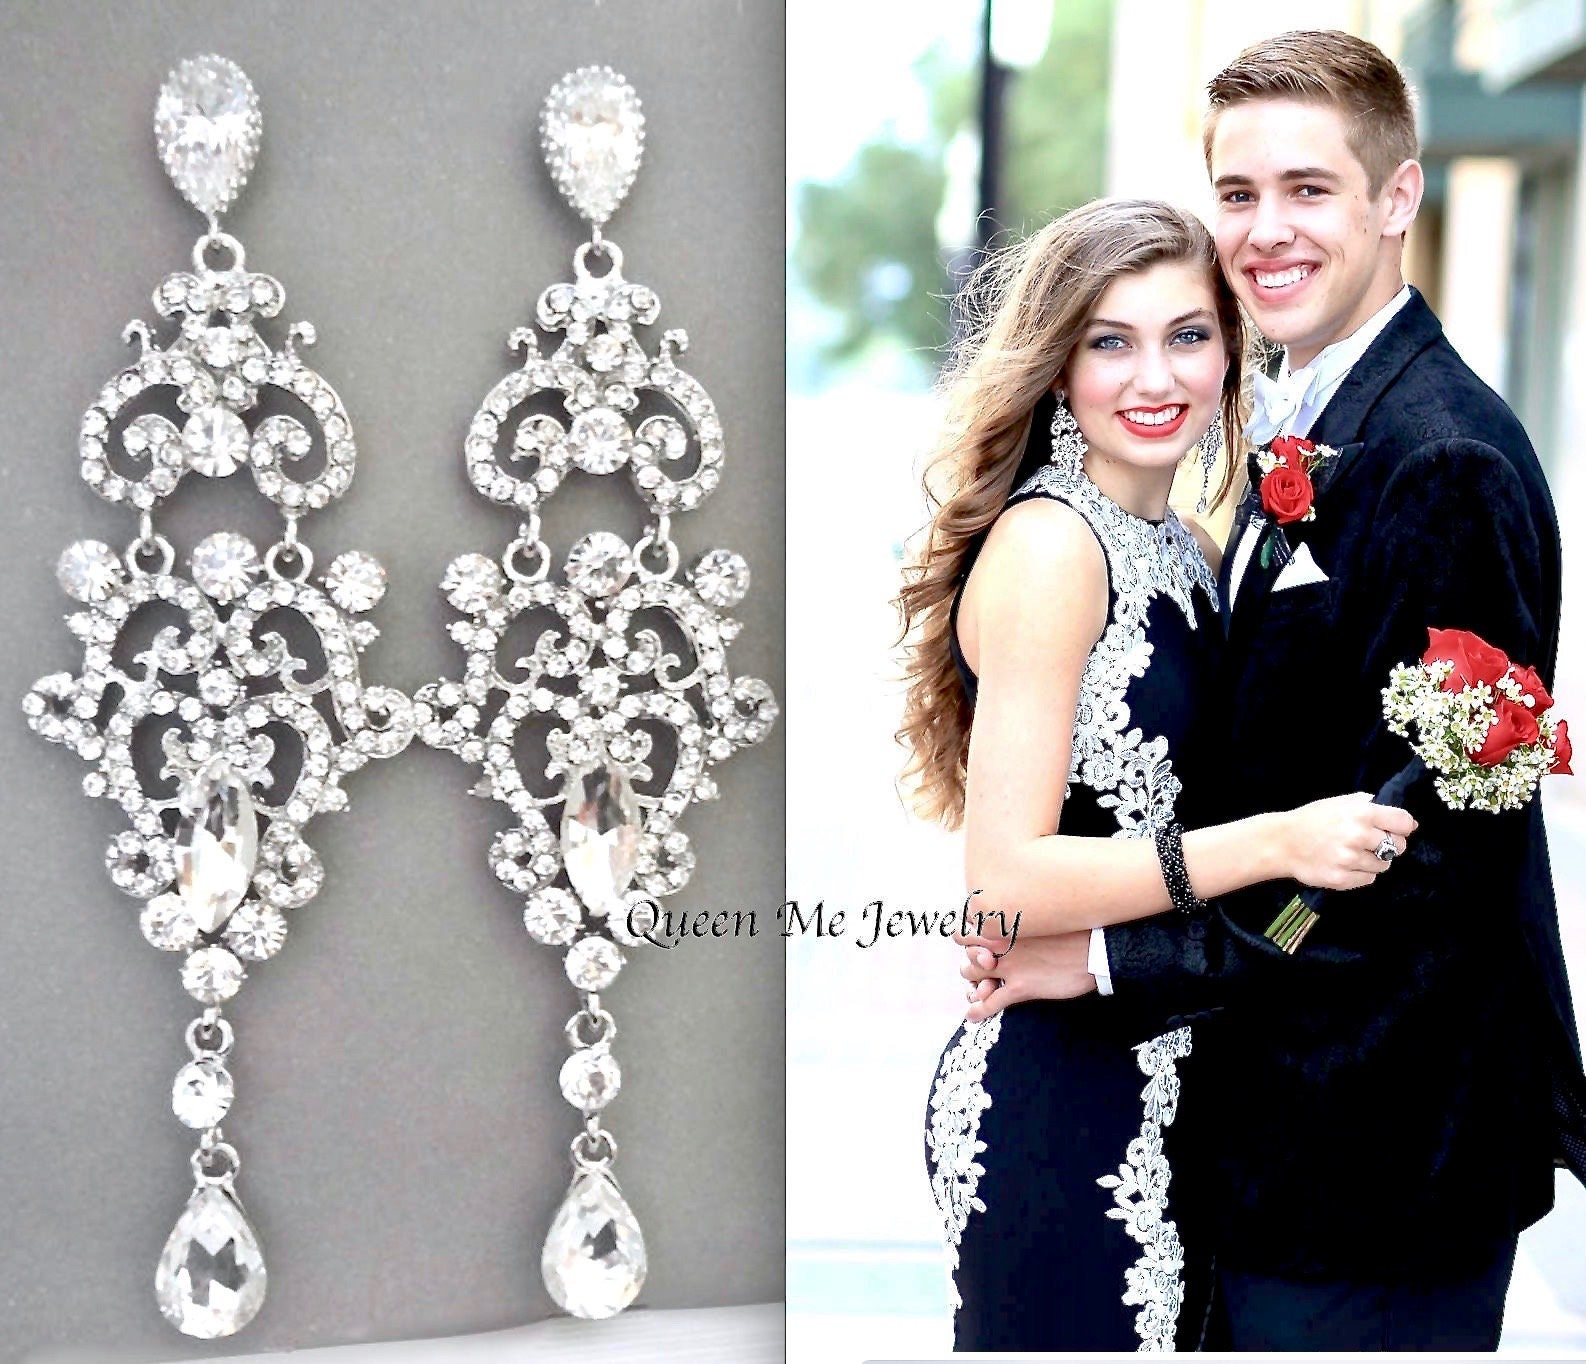 Bridal Jewelry Pageant Prom Earrings Sterling posts Statement Wedding Earrings for a Bride LEXI Long Crystal Chandelier Earrings